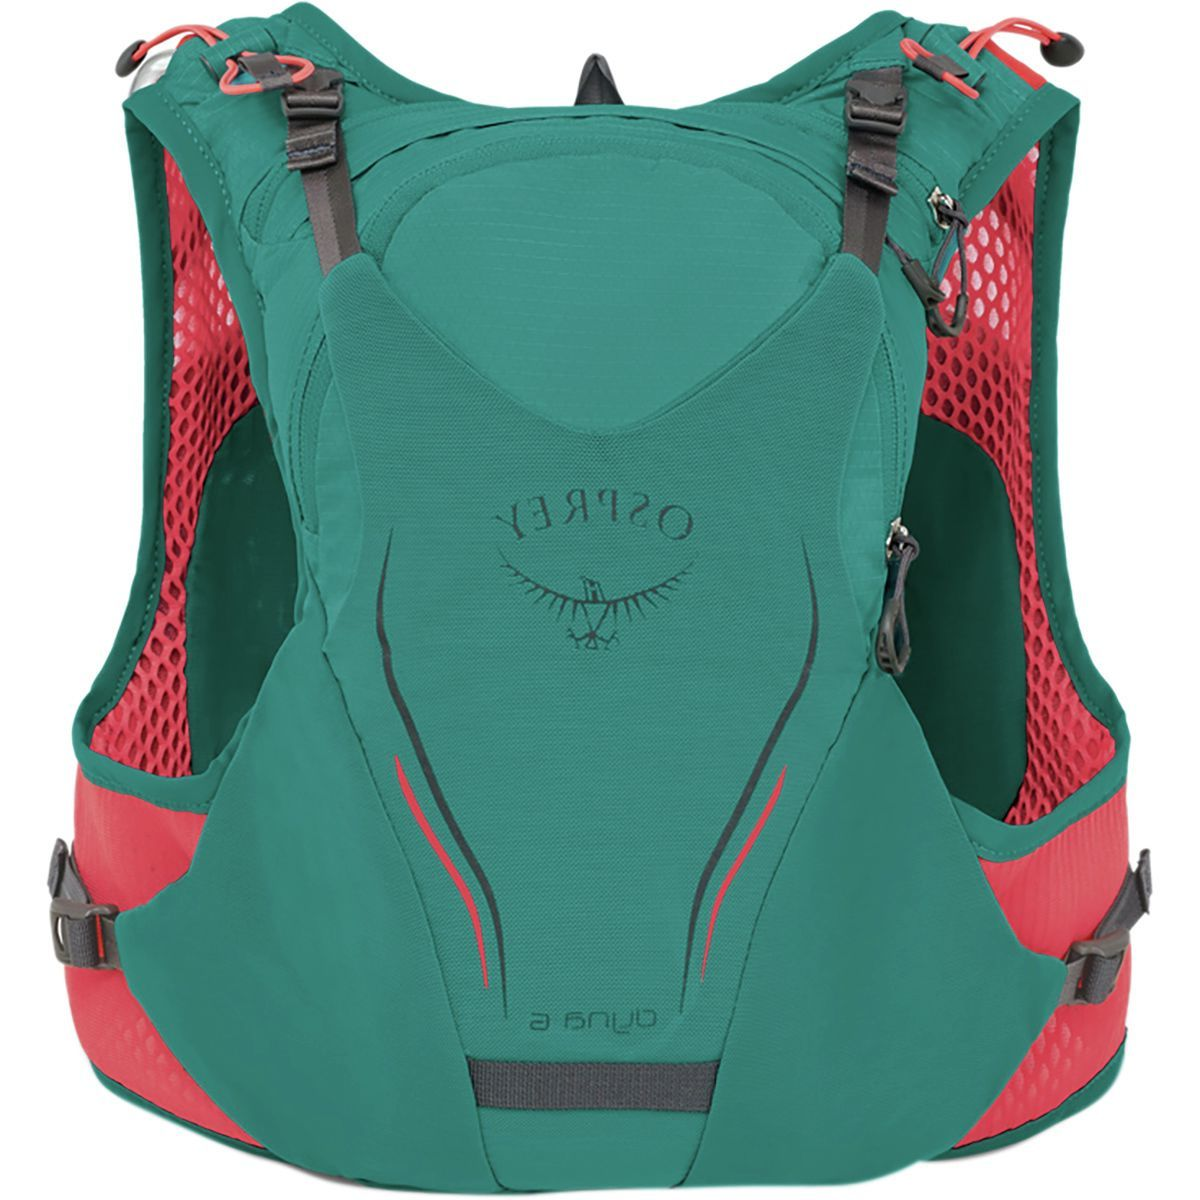 Osprey Packs Dyna 6L Backpack - Women's